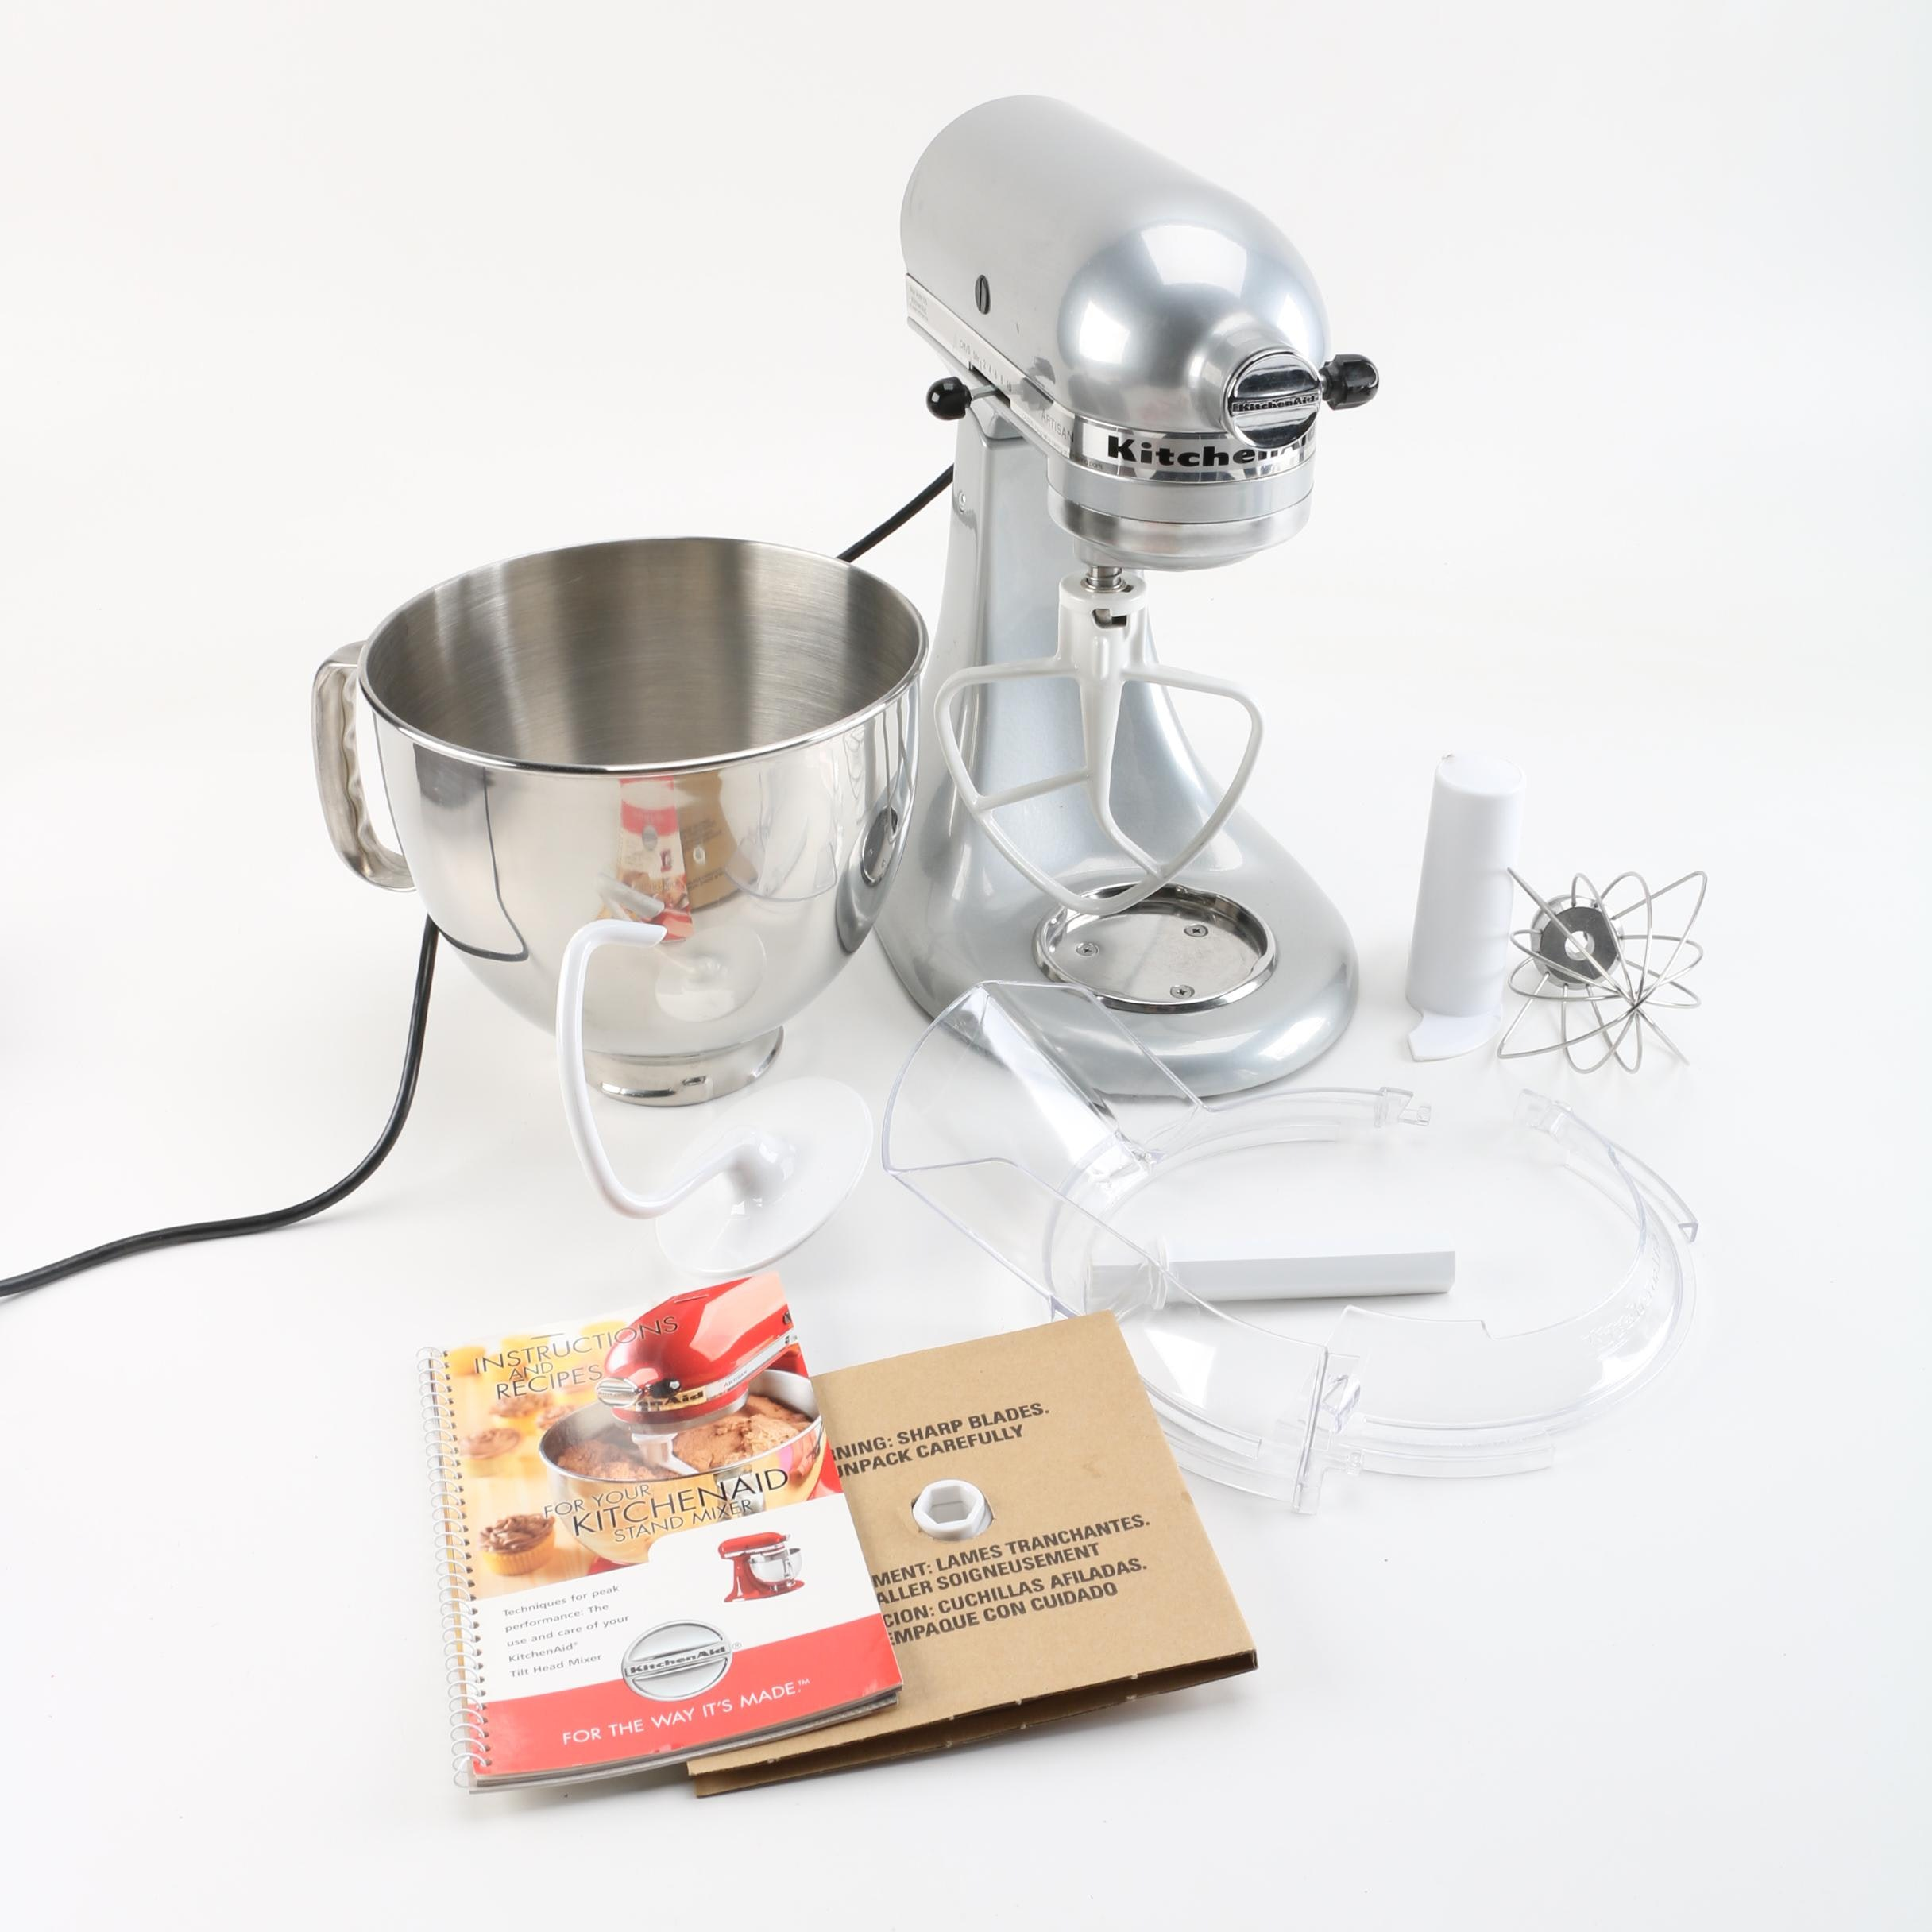 KitchenAid Artisan Stand Mixer with Accessories